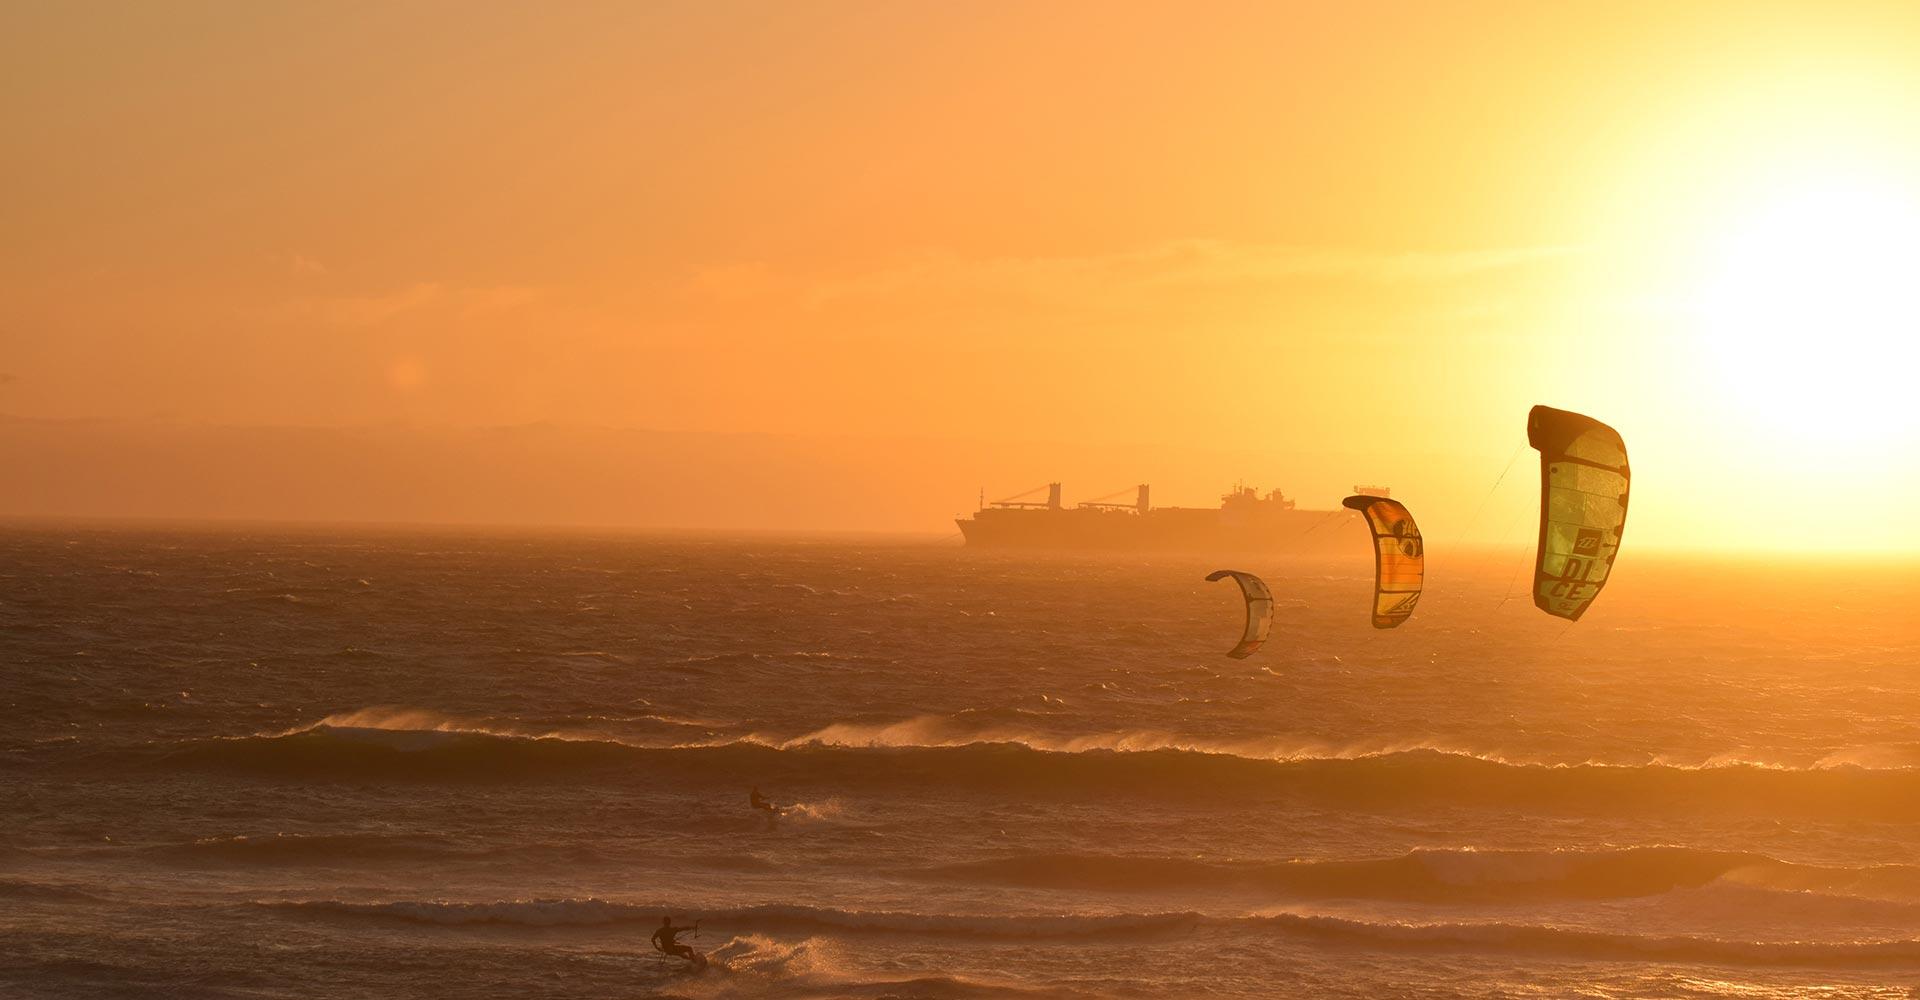 Boka en kitesurfing kurs med Gusty kiteskola